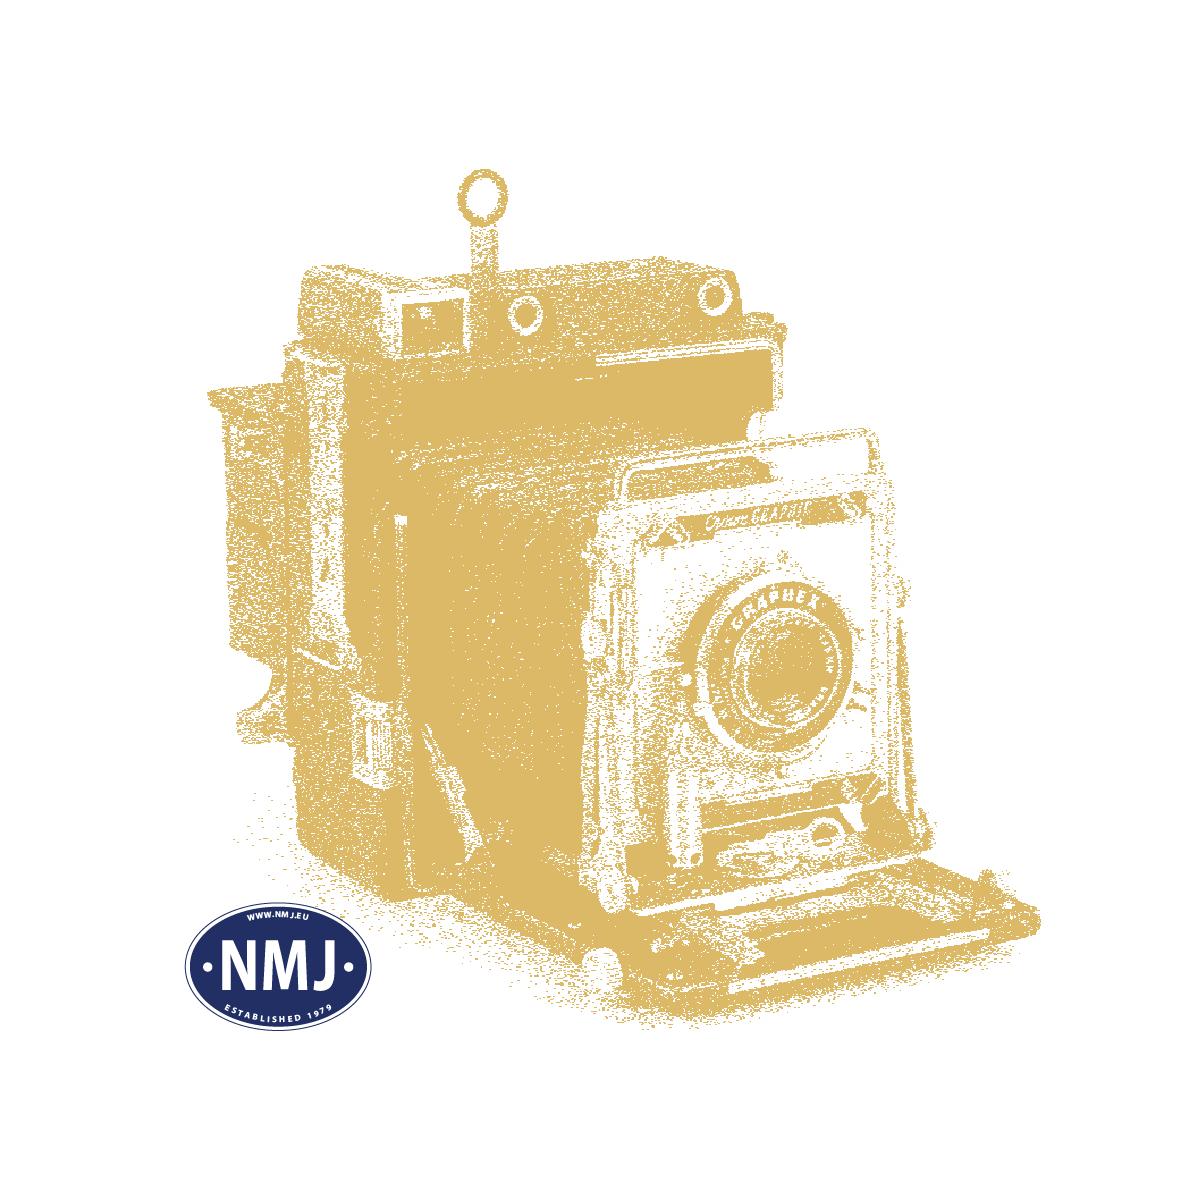 NMJ Topline & Skyline Katalog 2016